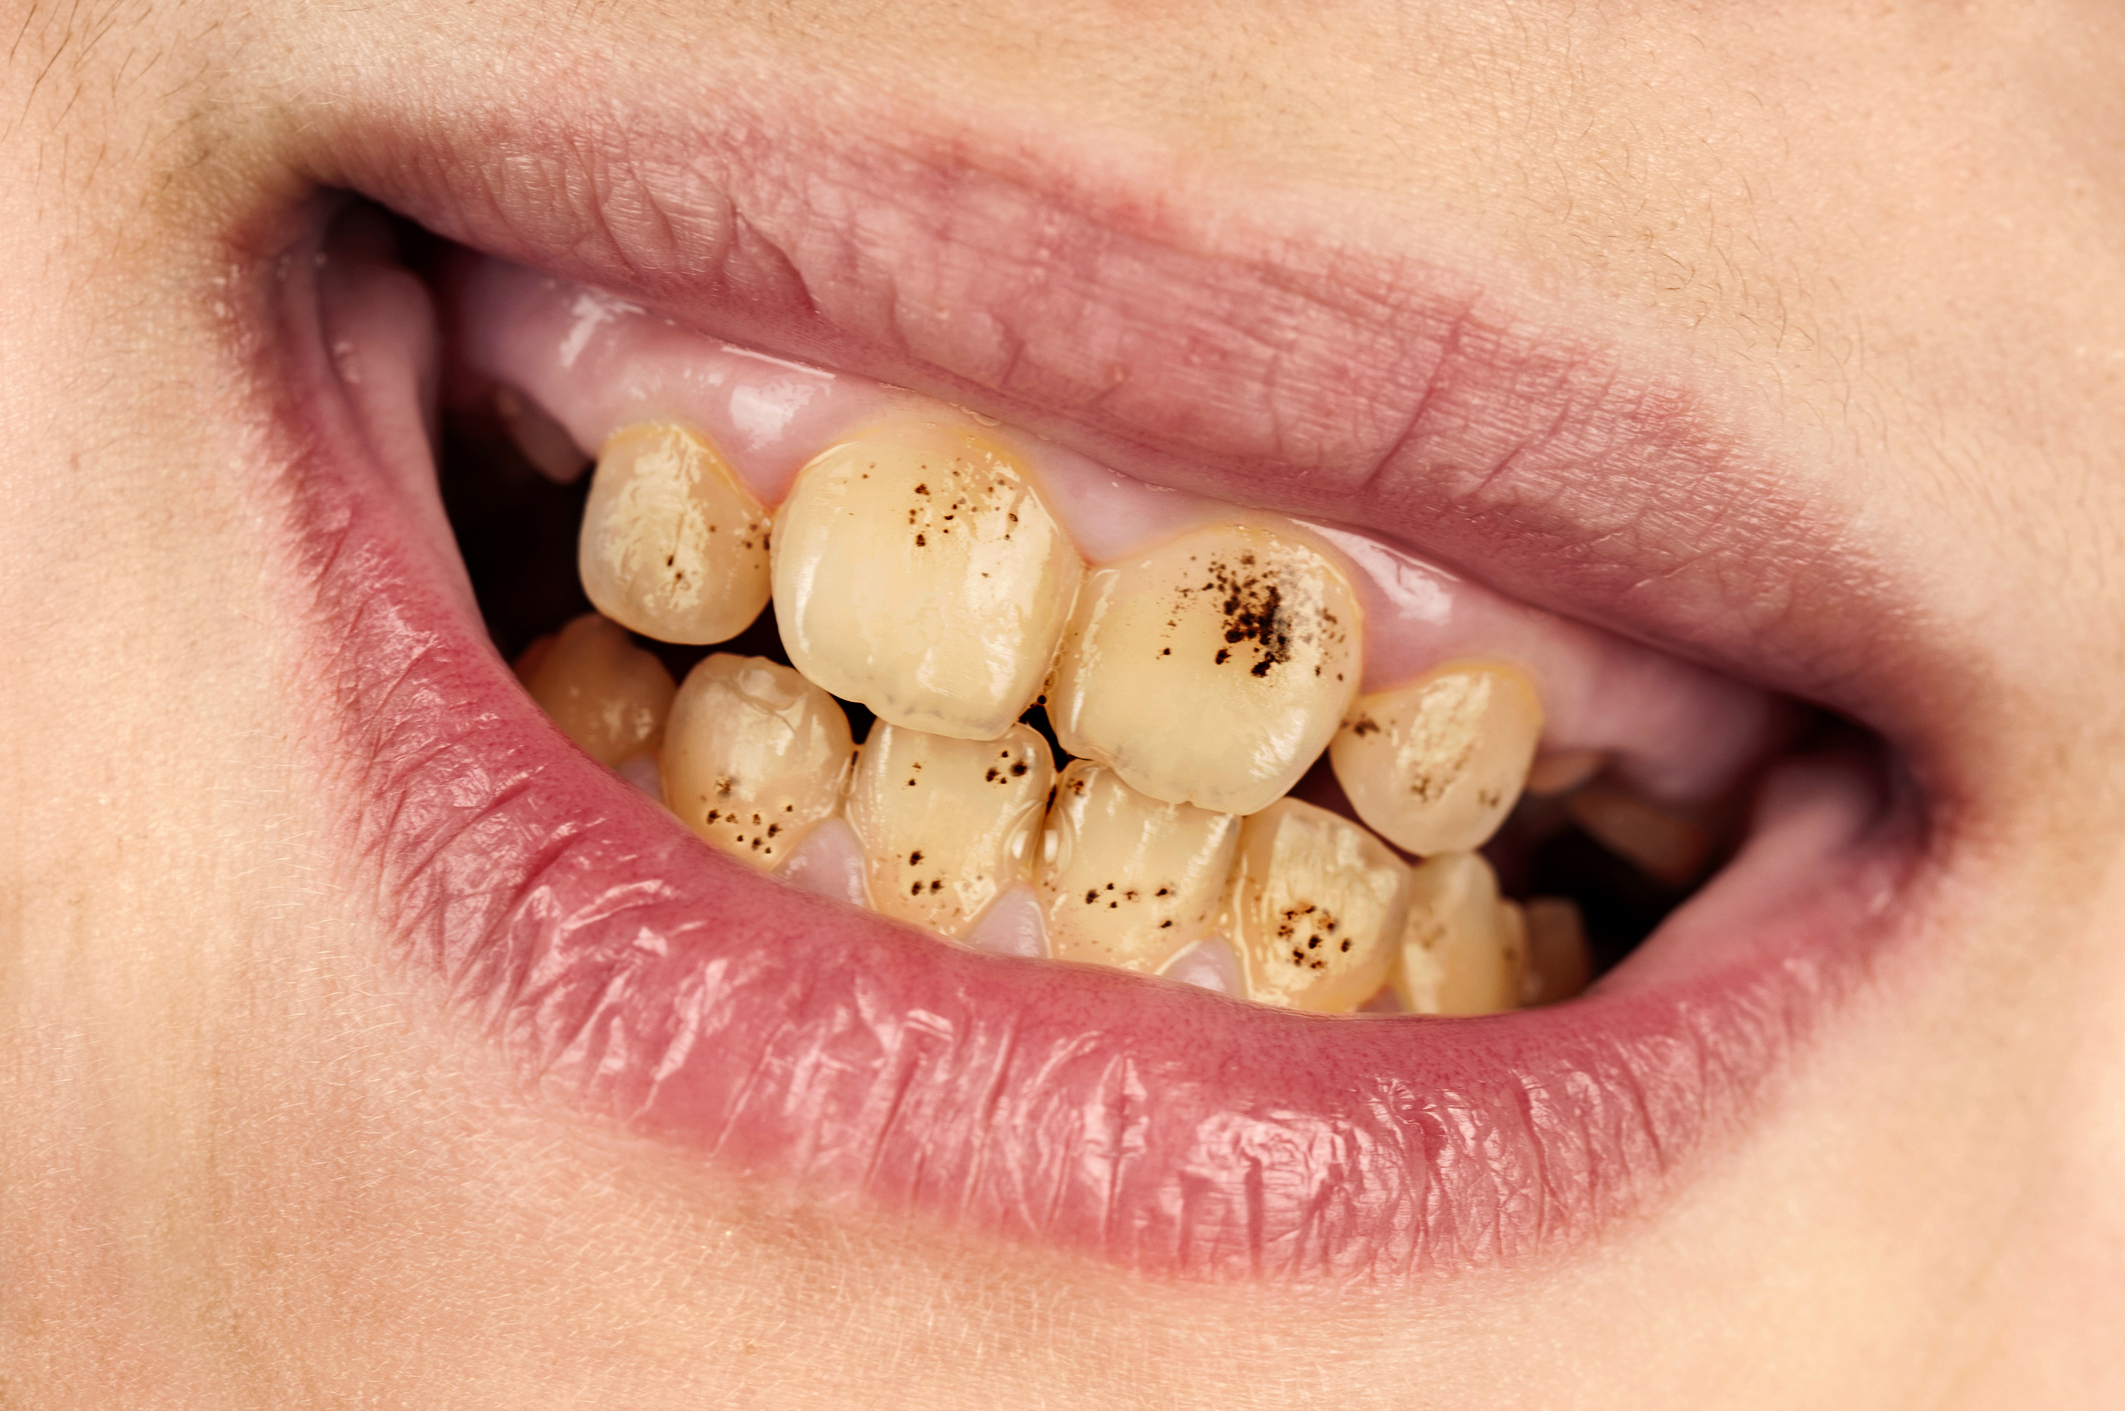 Congenital Dental Disorders